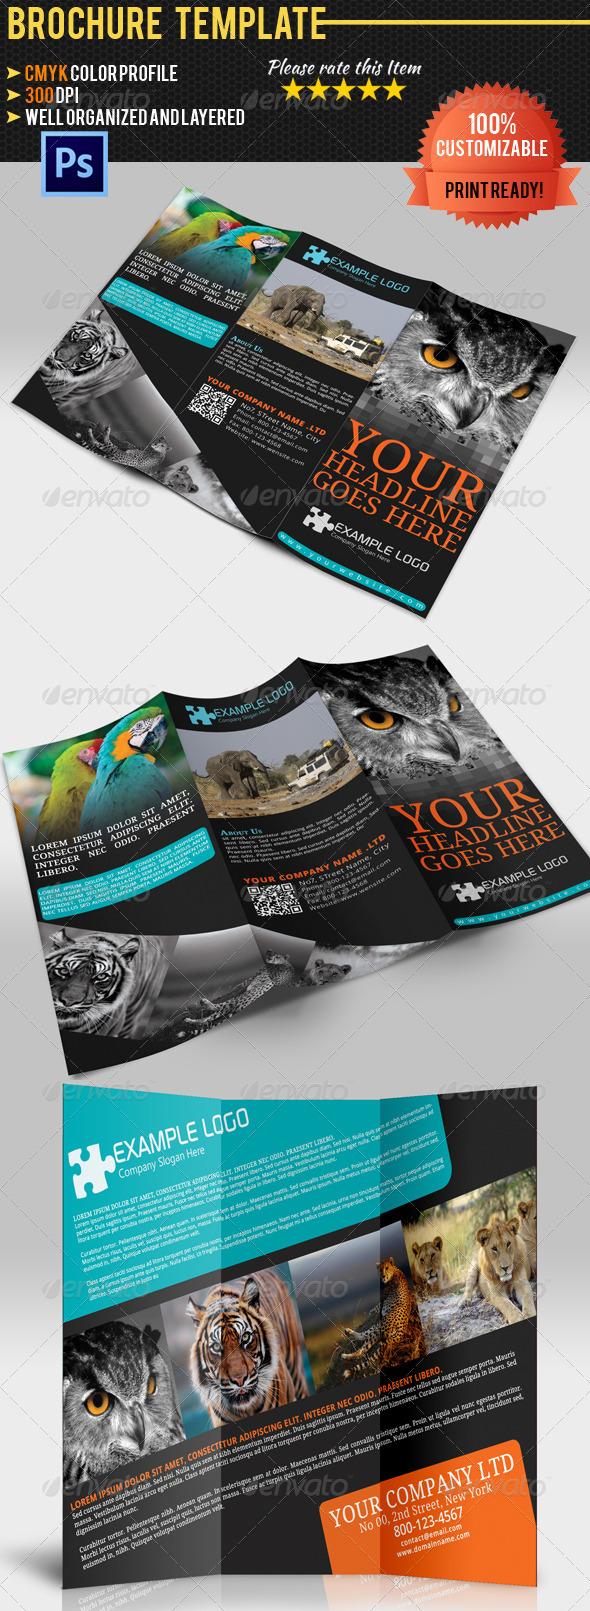 GraphicRiver Adventure Travel Brochure Templatre 4727926